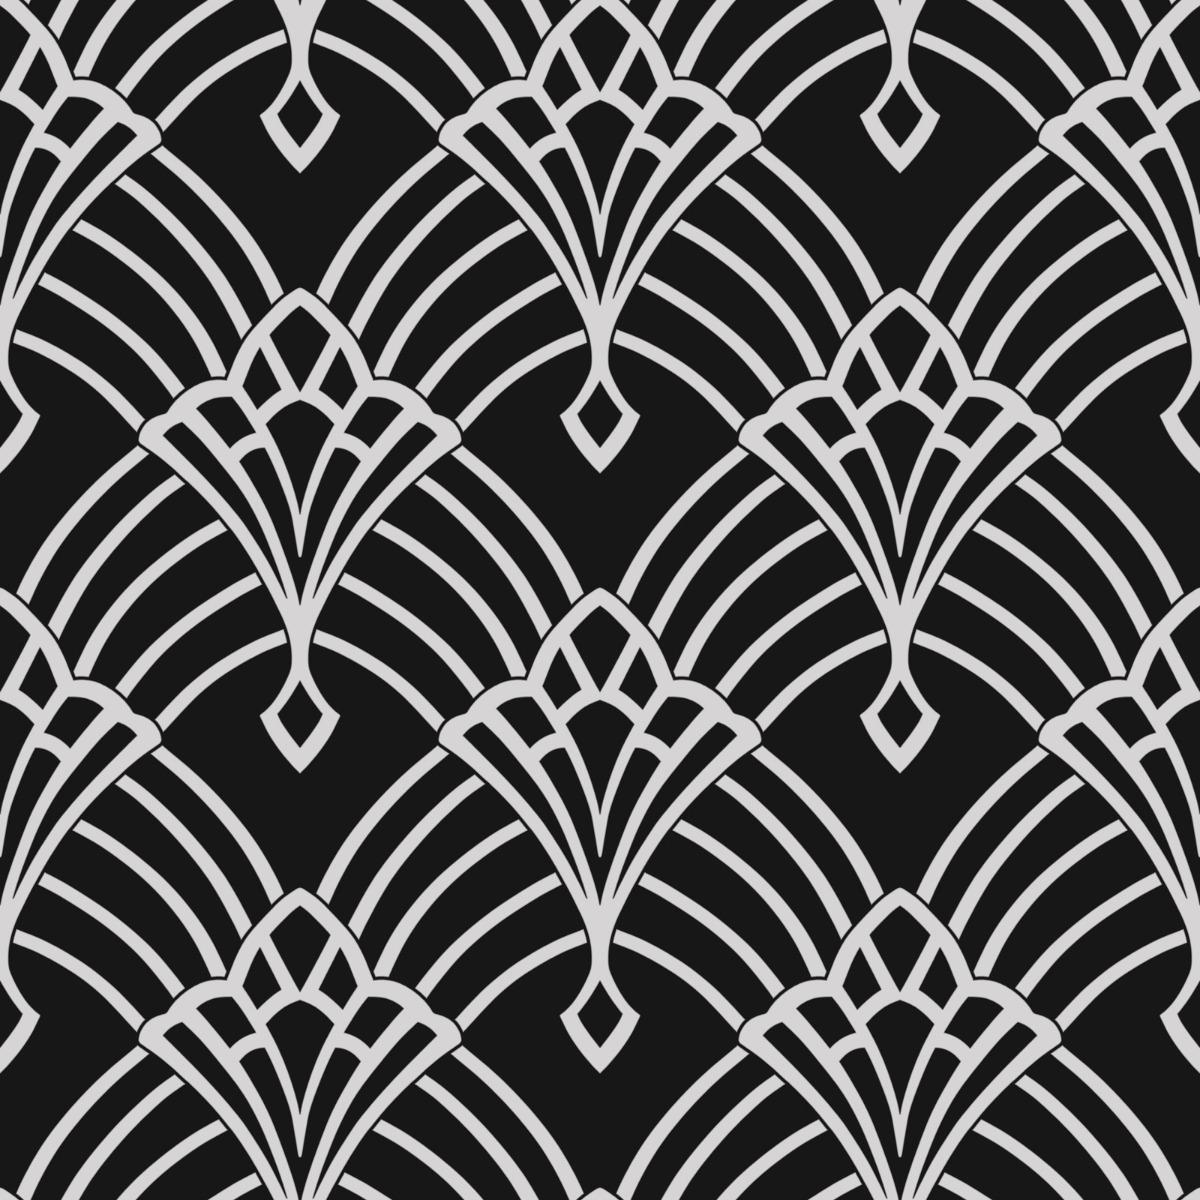 Waldorf Deco Wallpaper Black Silver World Of Wallpaper 274430